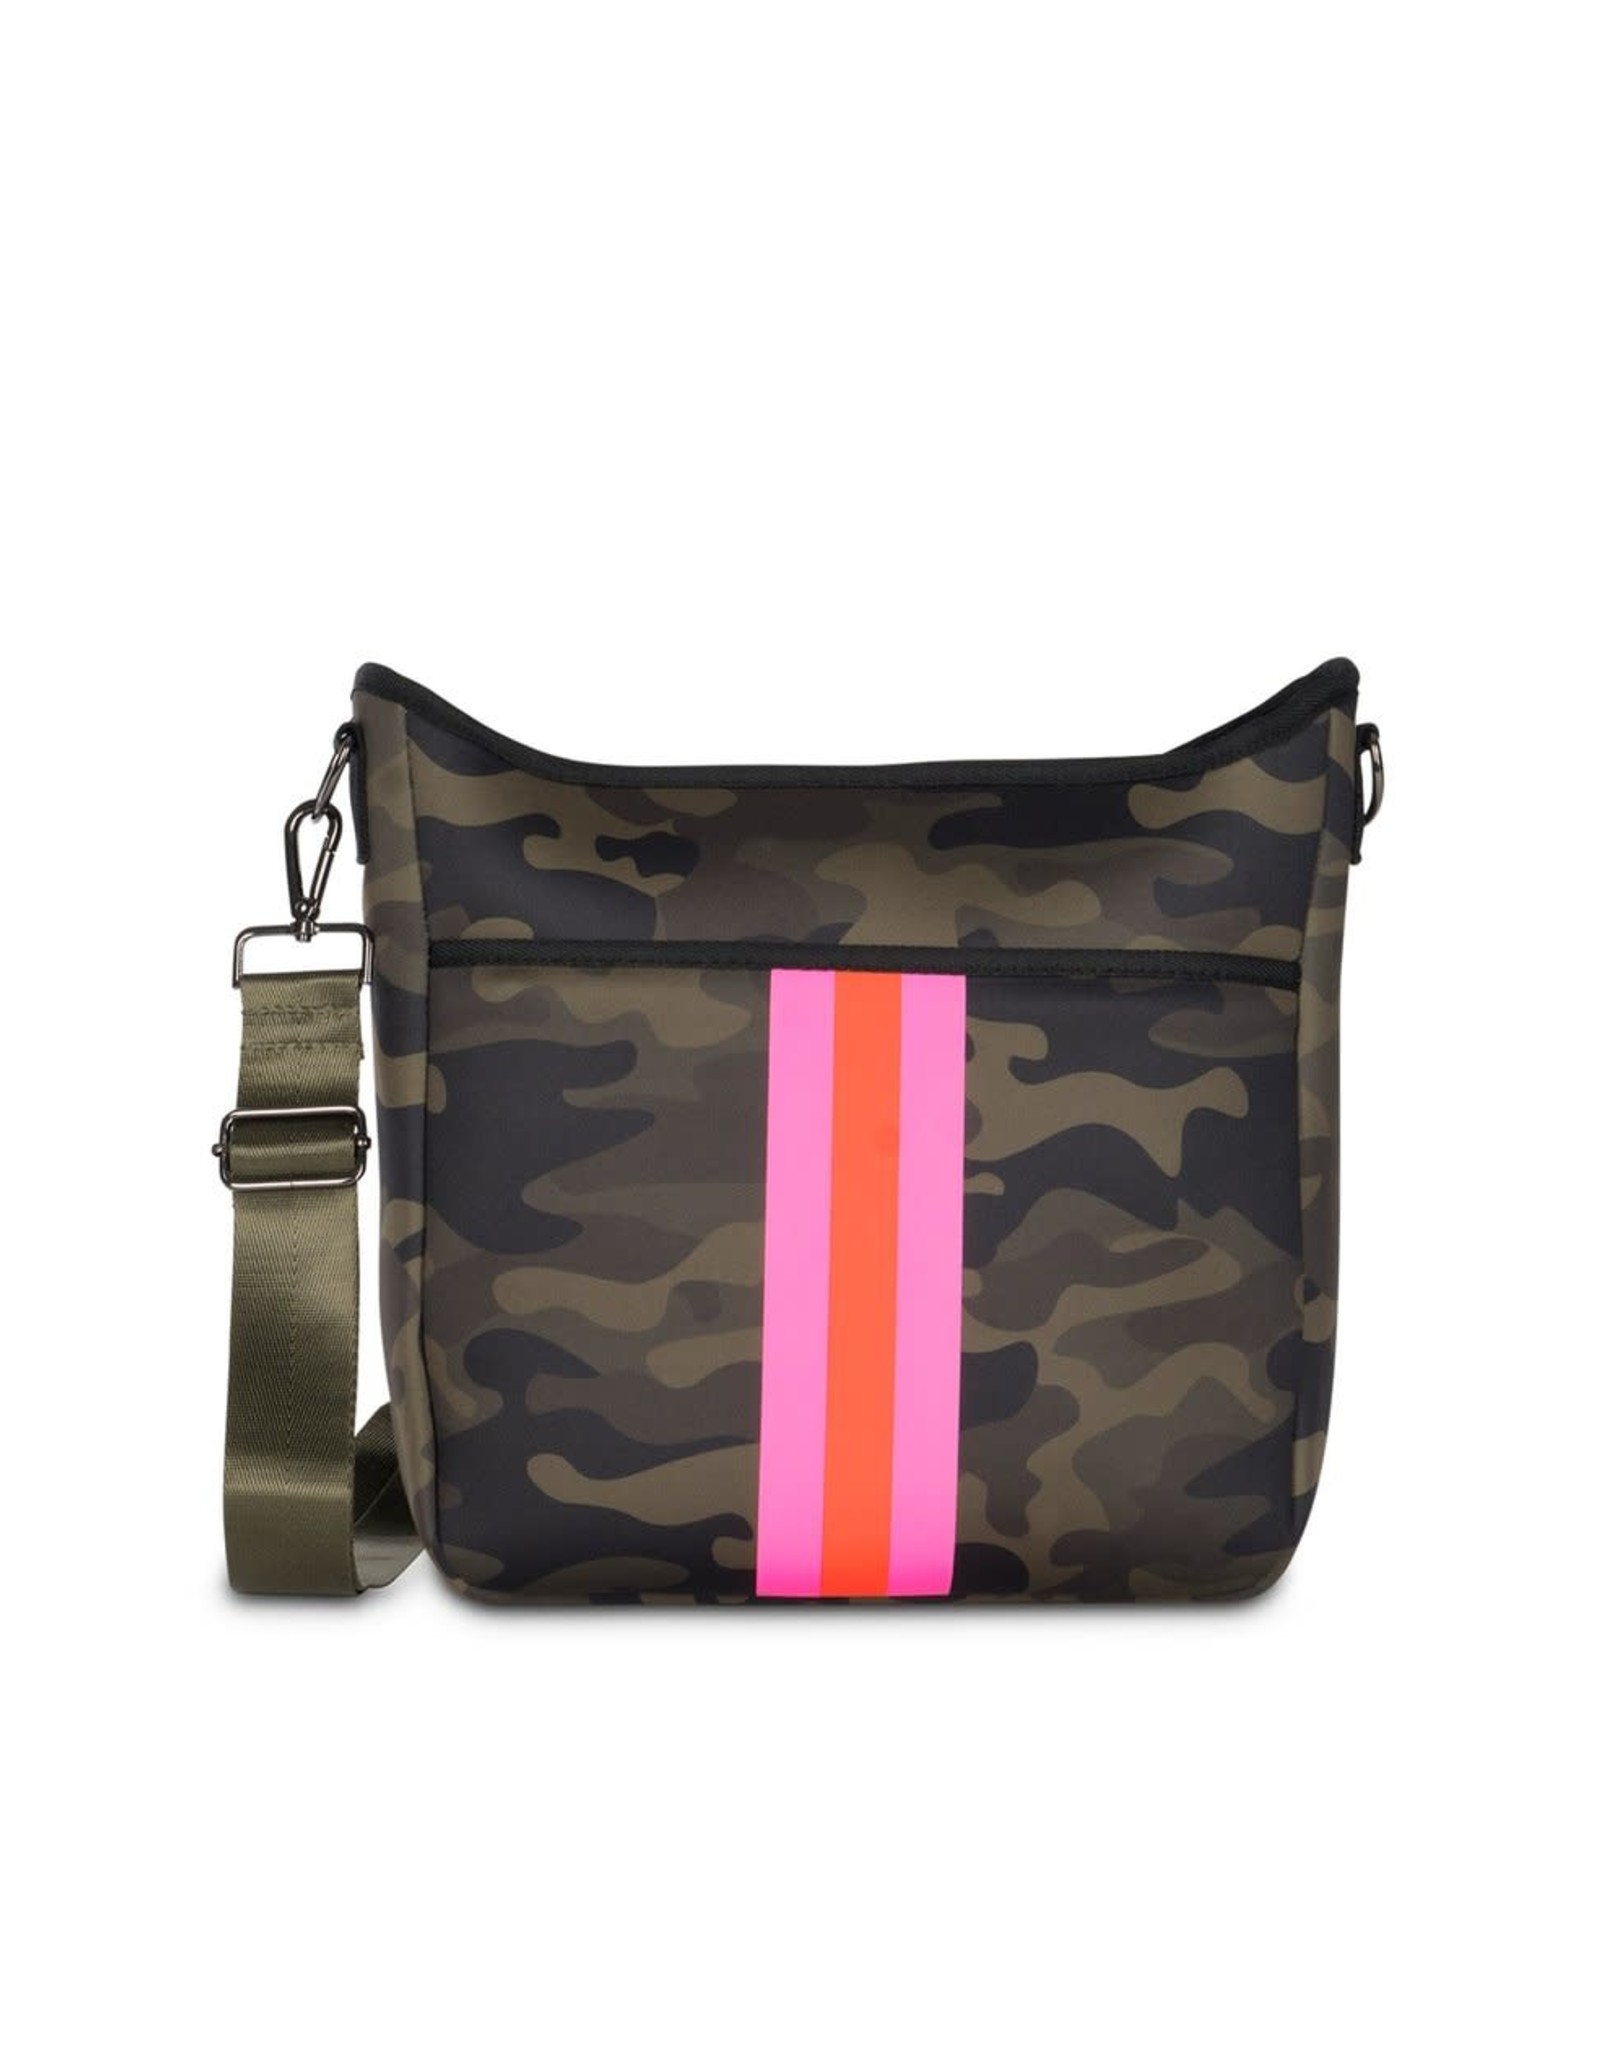 Blake Crossbody Showoff- Green Camo-Pink Stripe